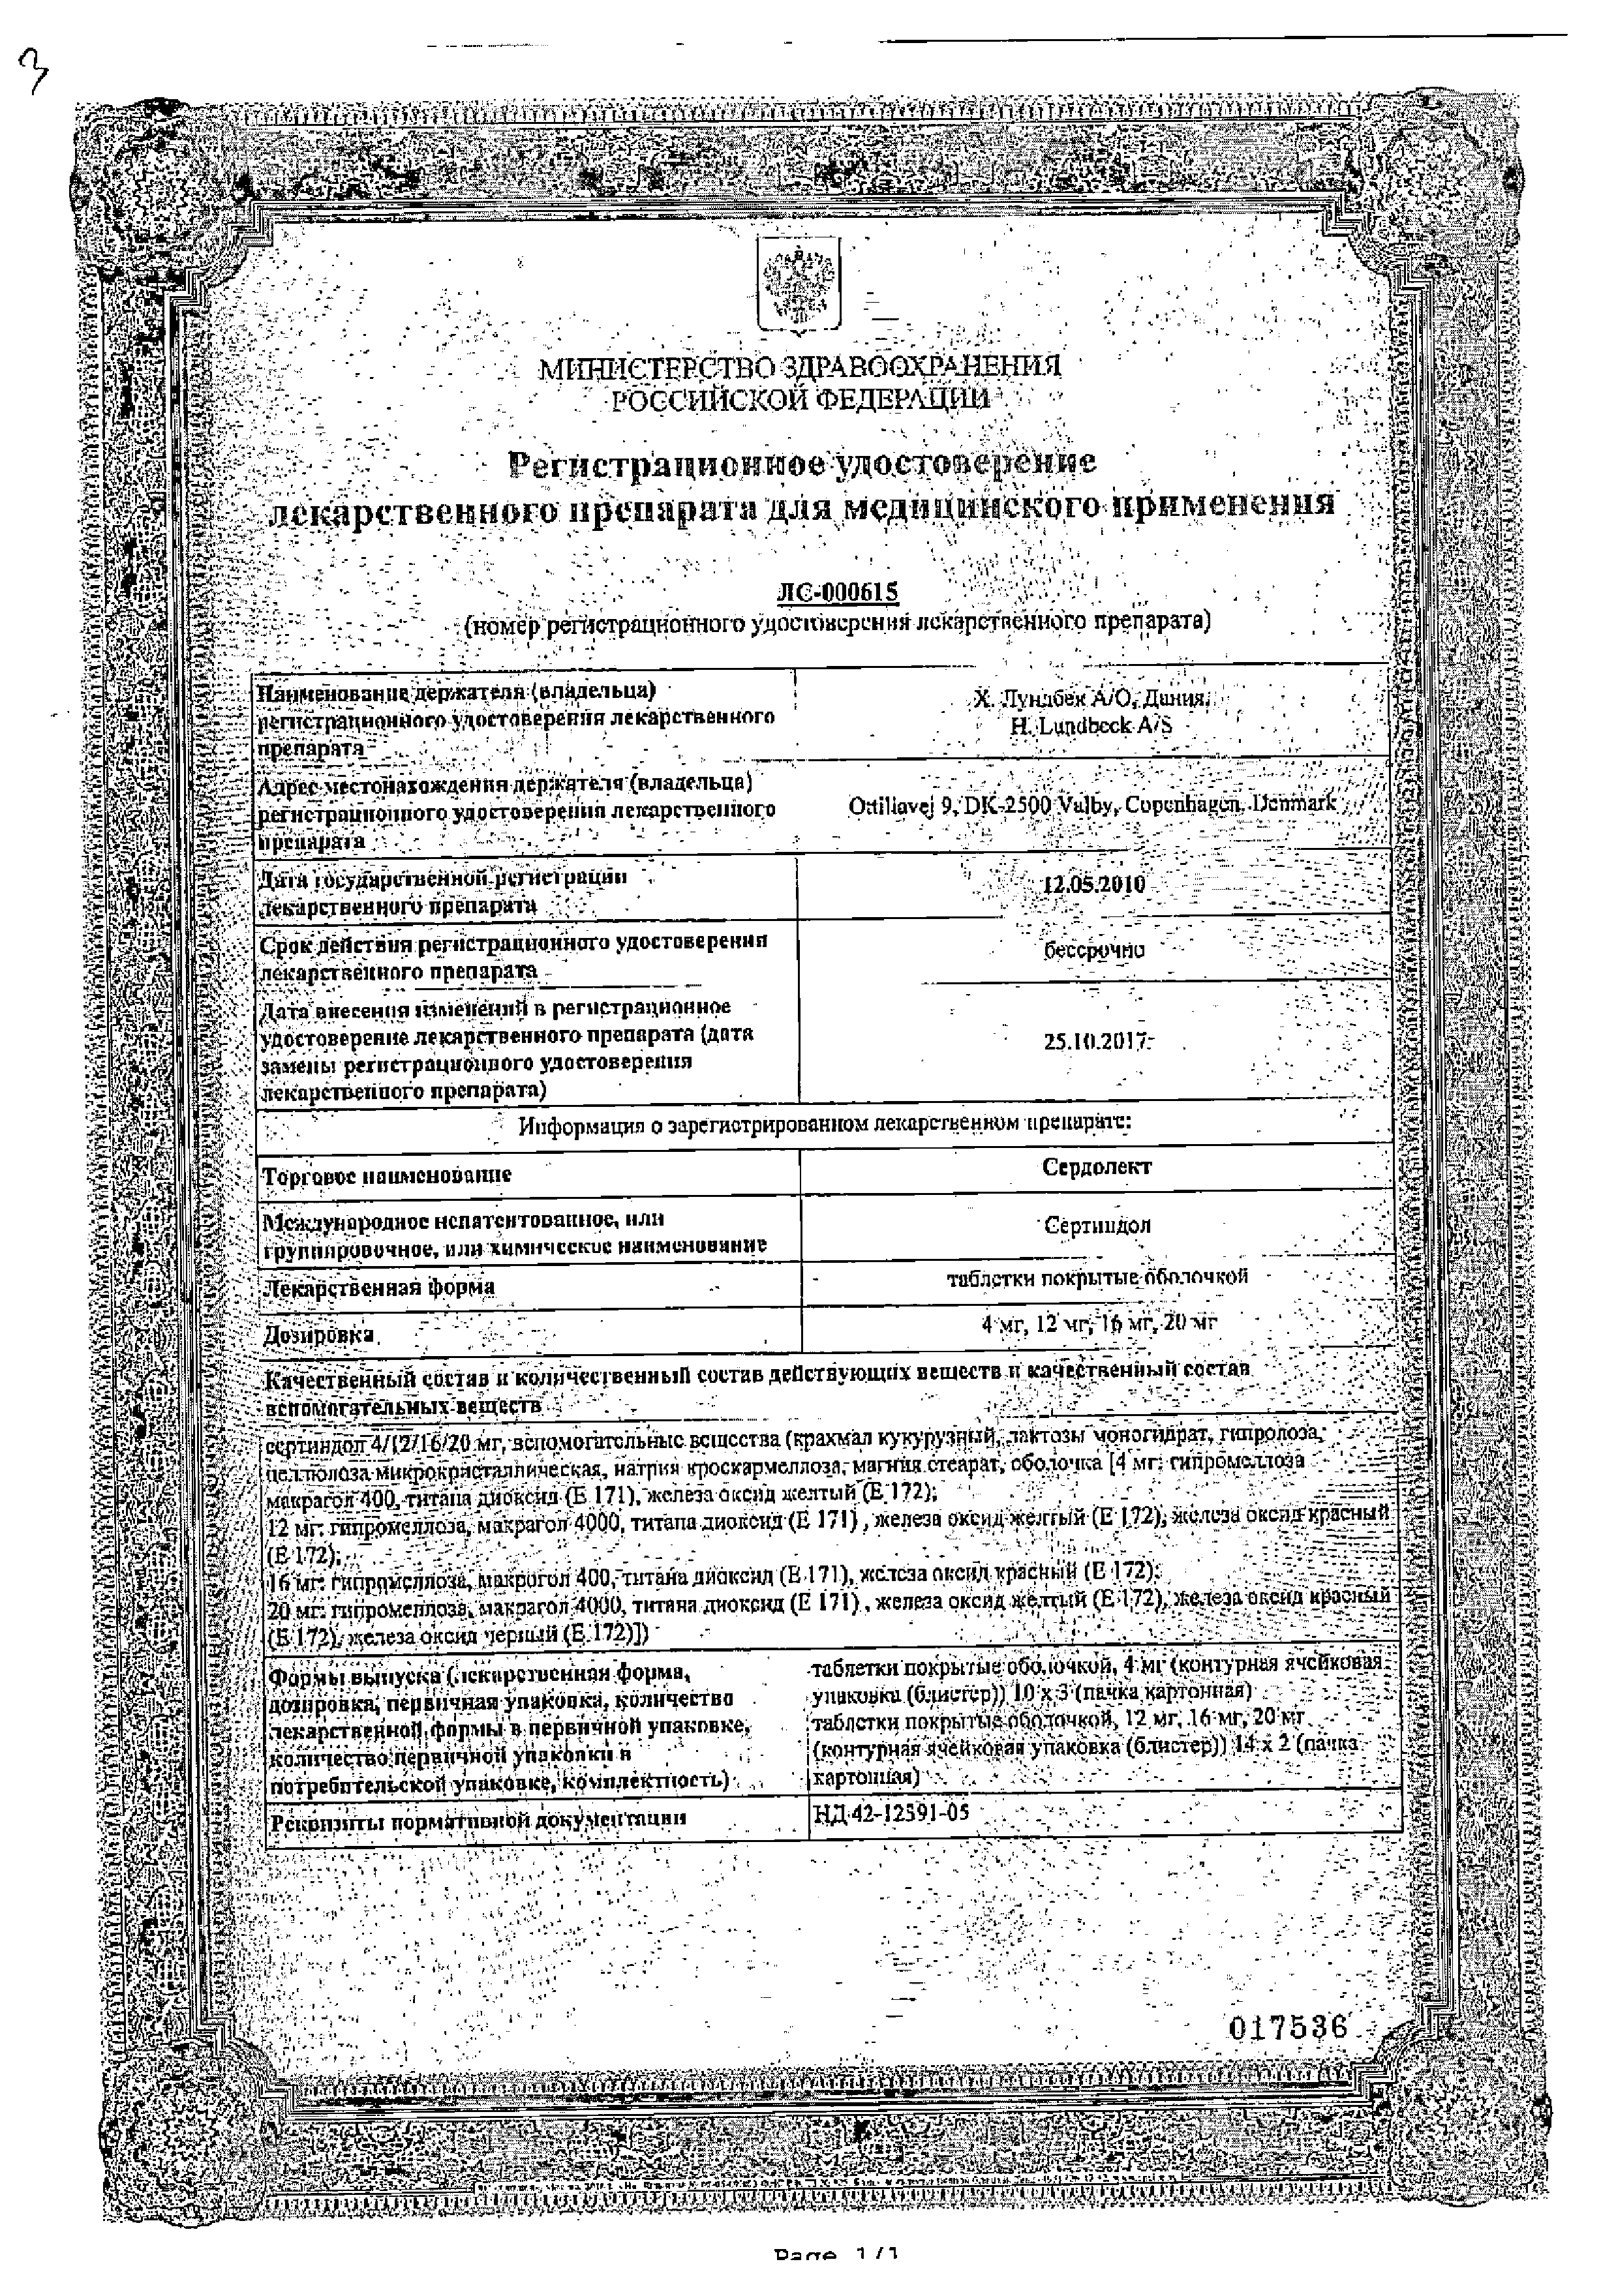 Сердолект сертификат